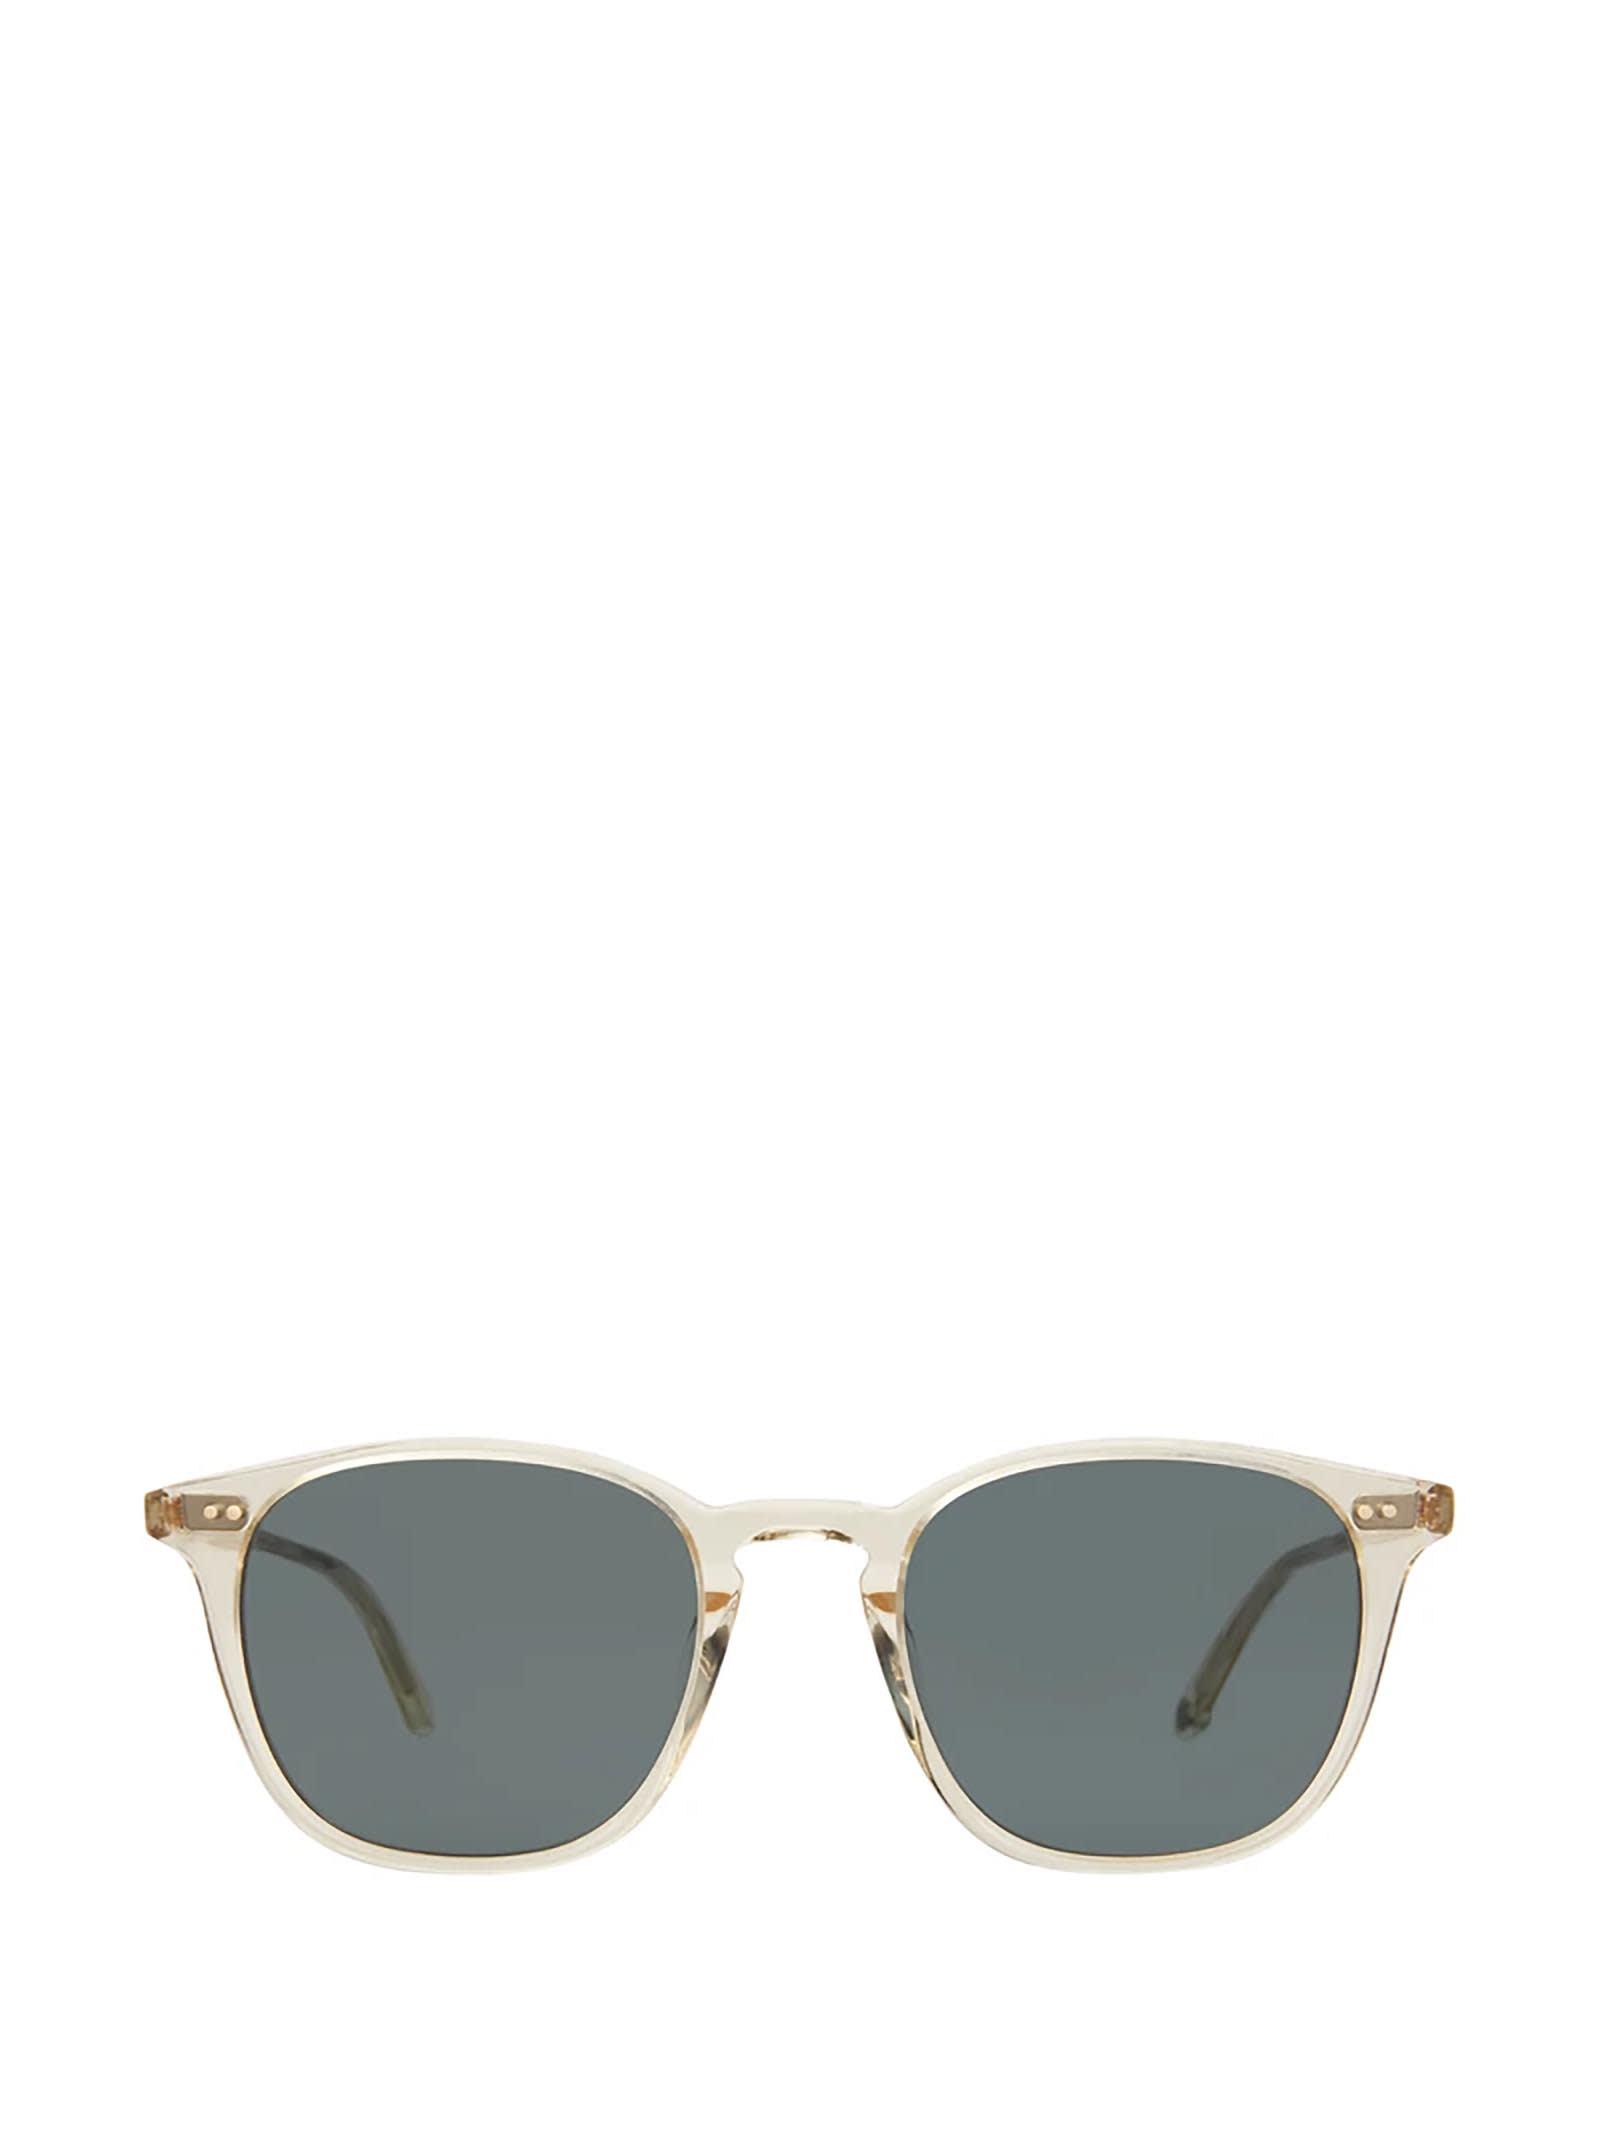 Garrett Leight Garrett Leight Clark Sun Pure Glass Sunglasses